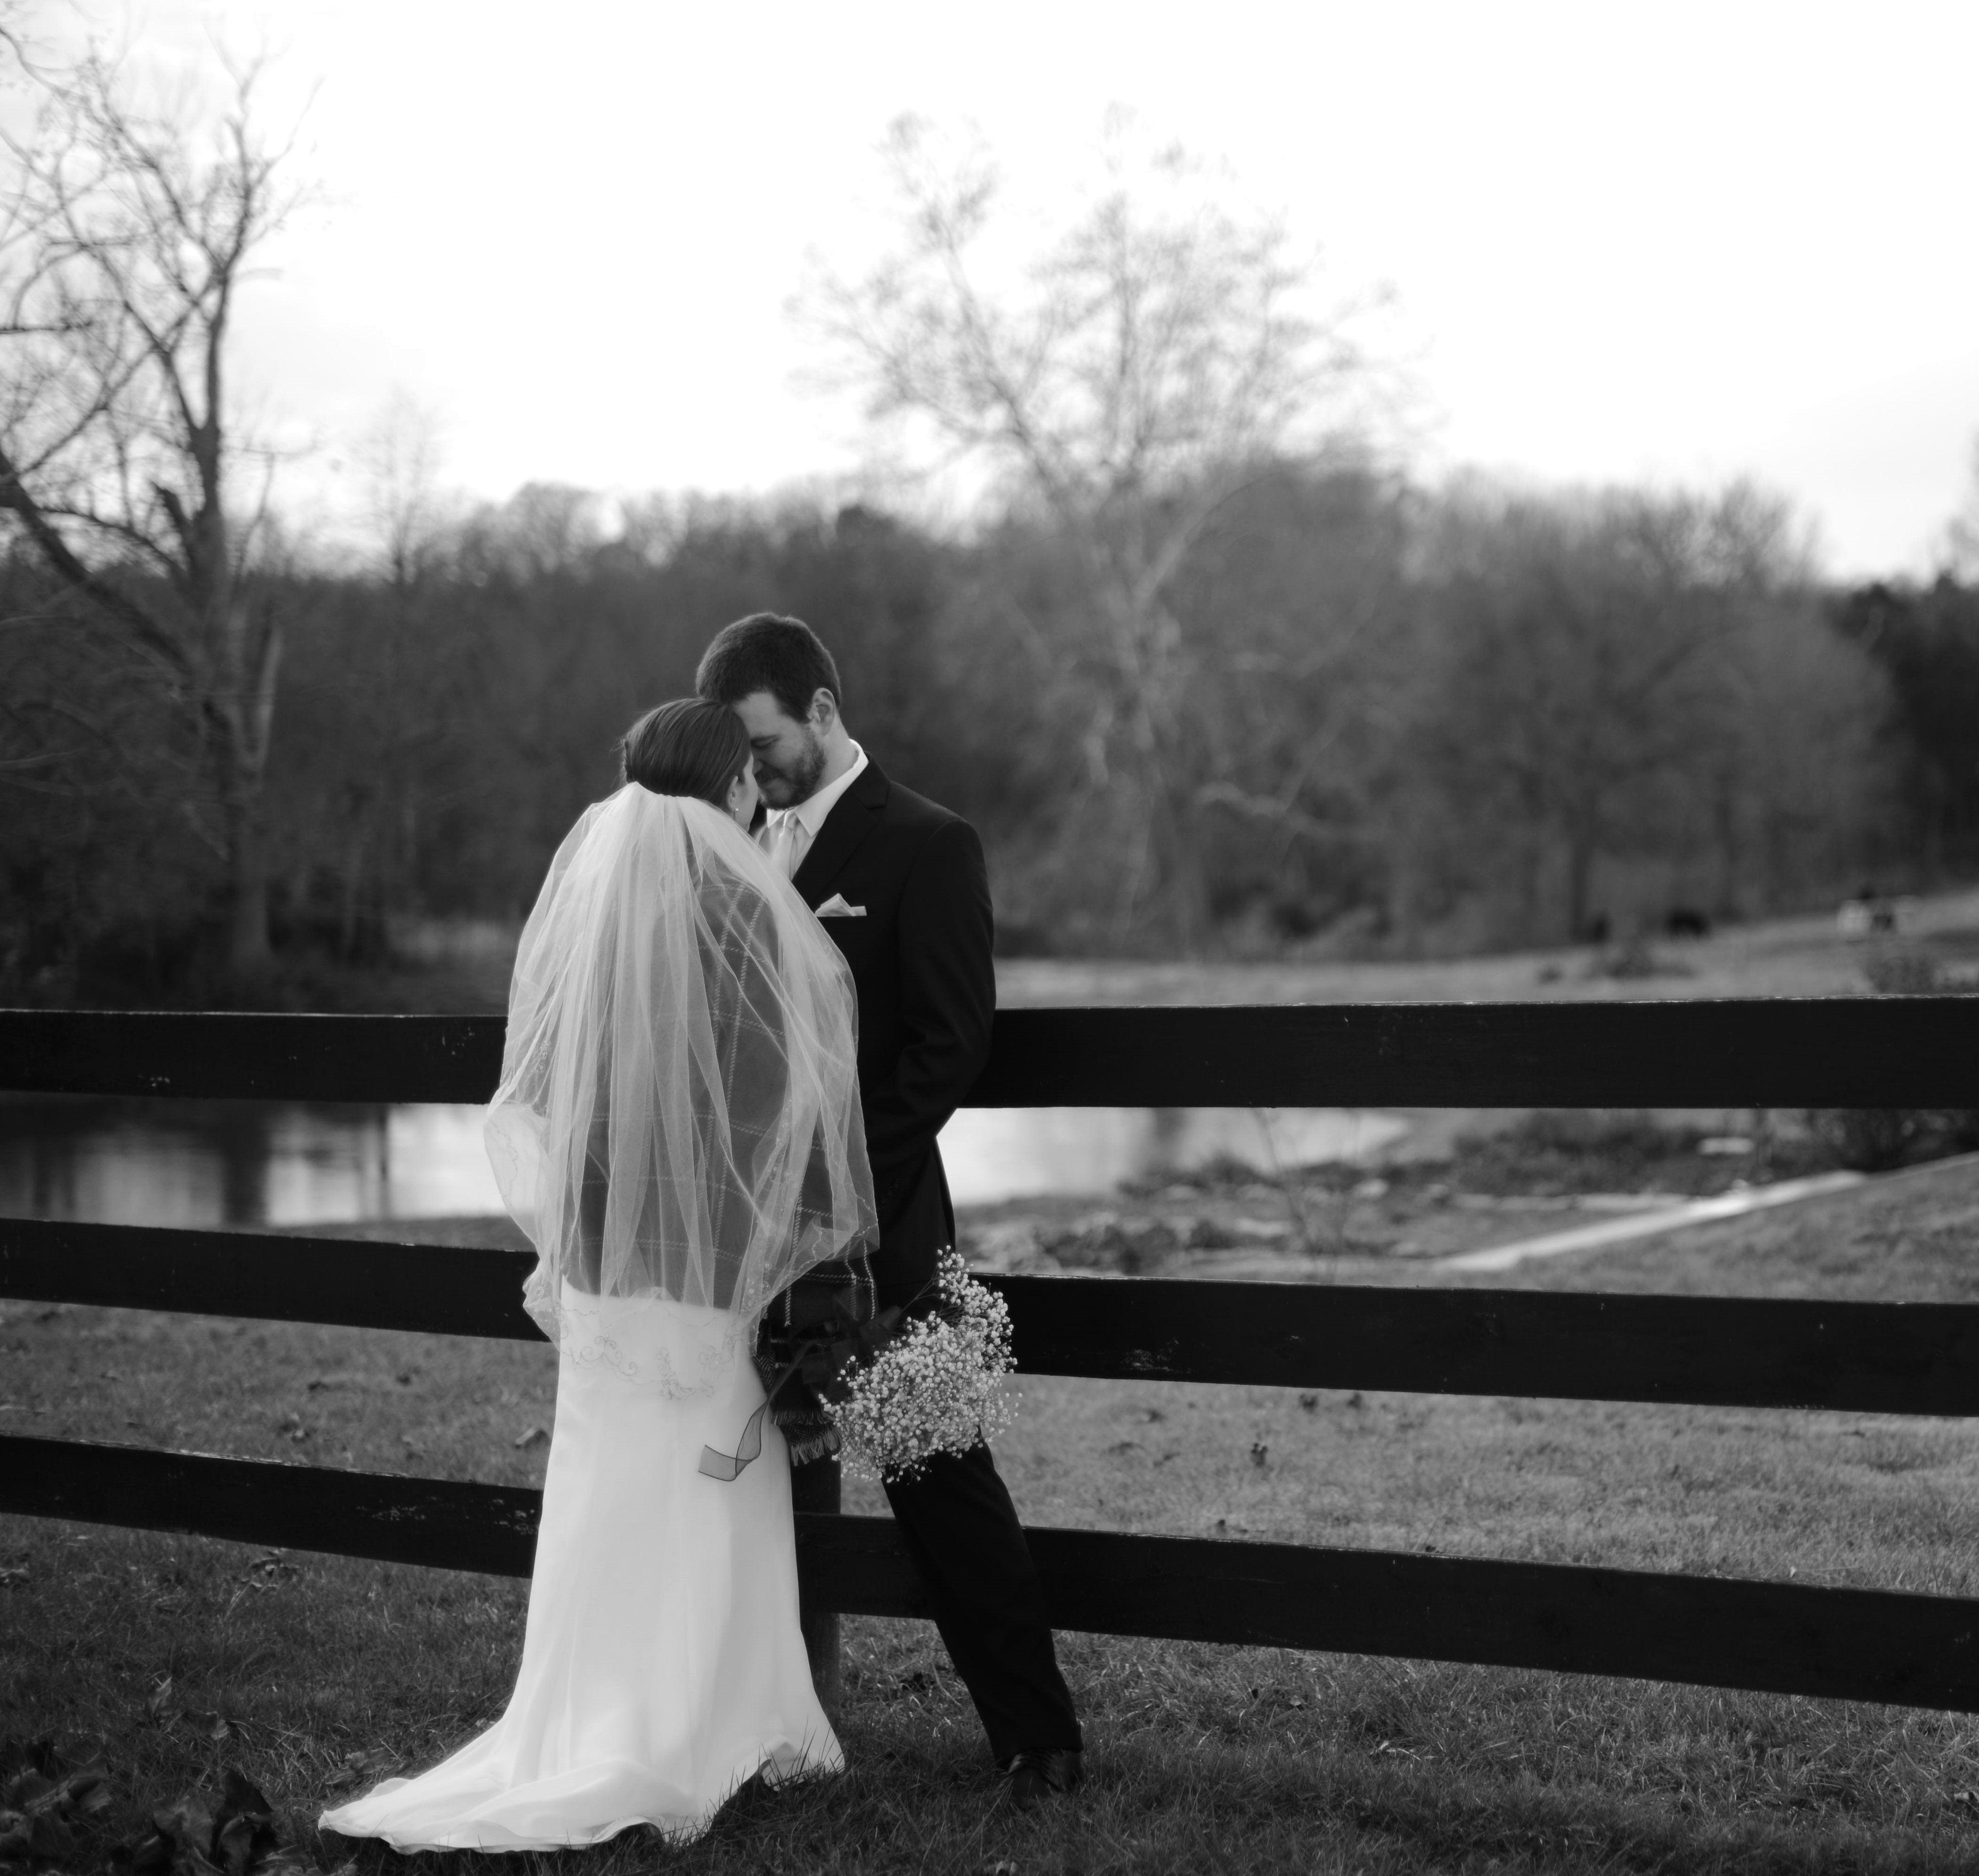 Louisville, Kentucky Barn Wedding Venue - All Inclusive ...